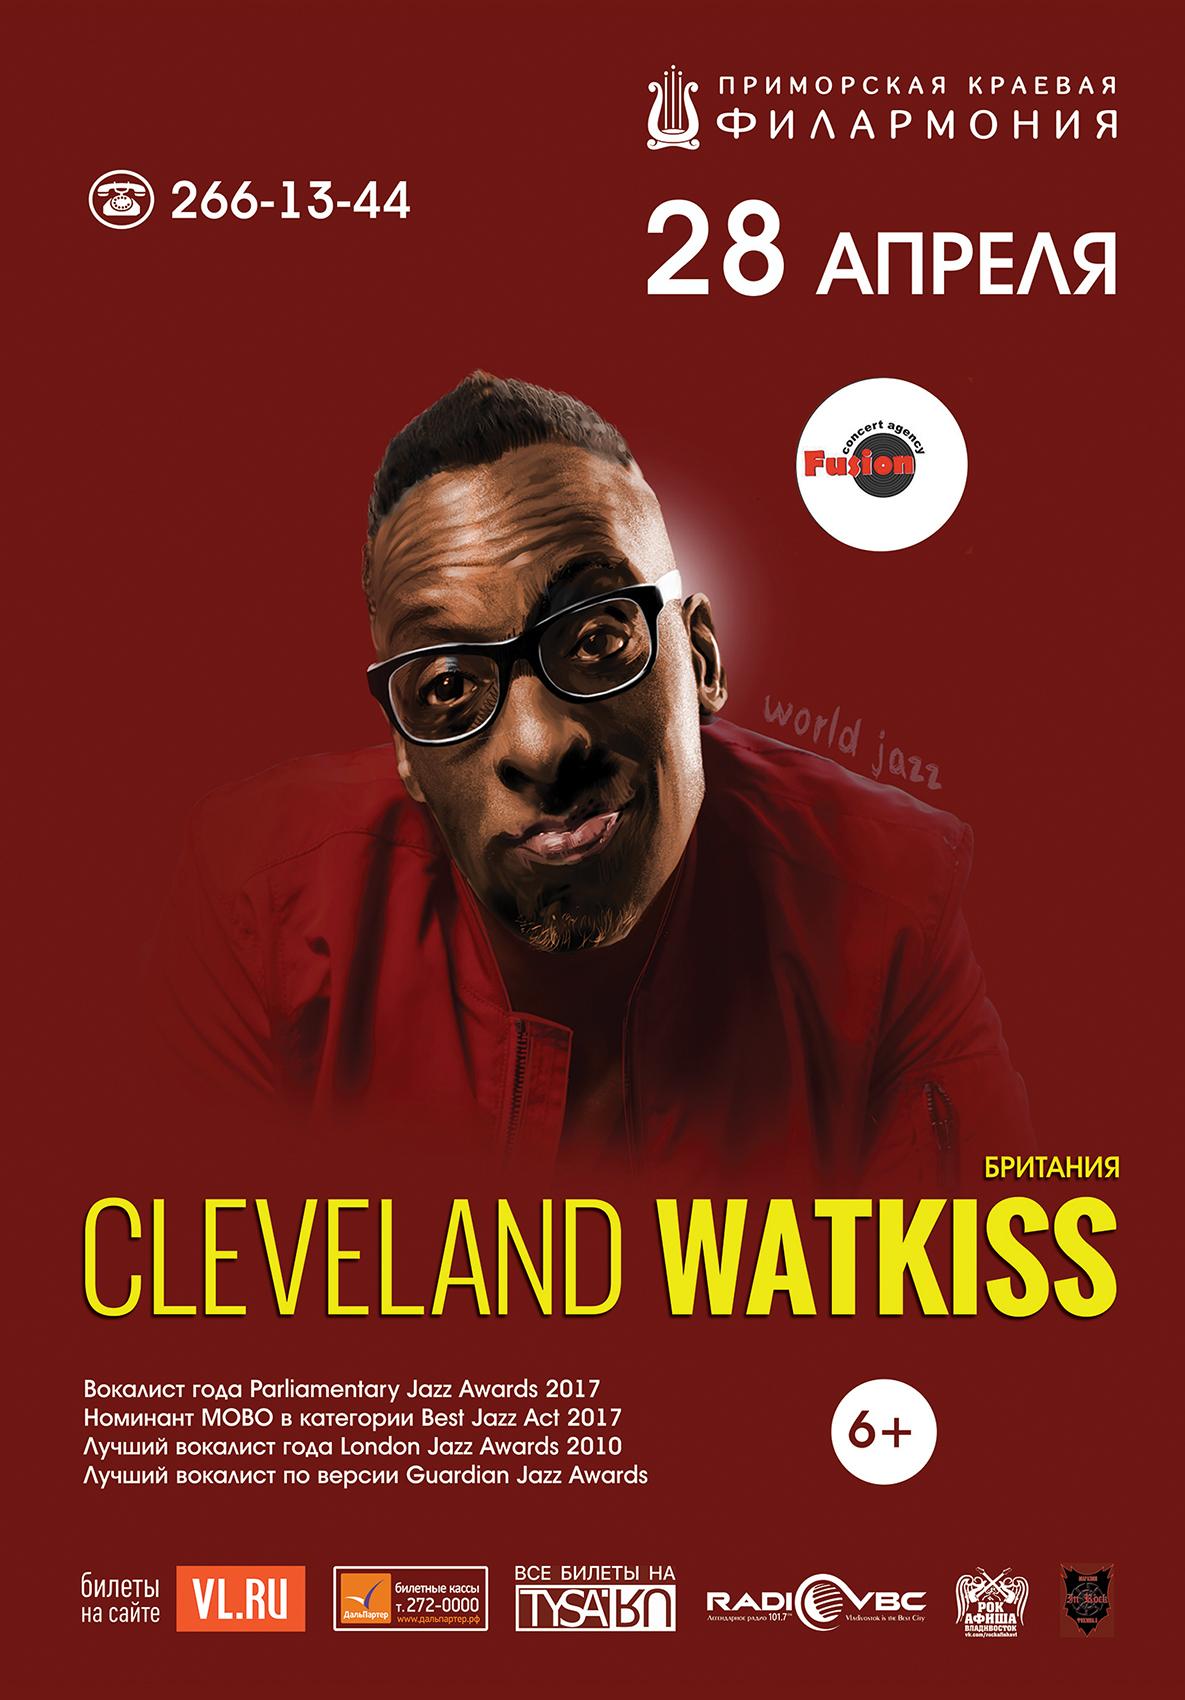 28 апреля Cleveland Watkiss (Великобритания)